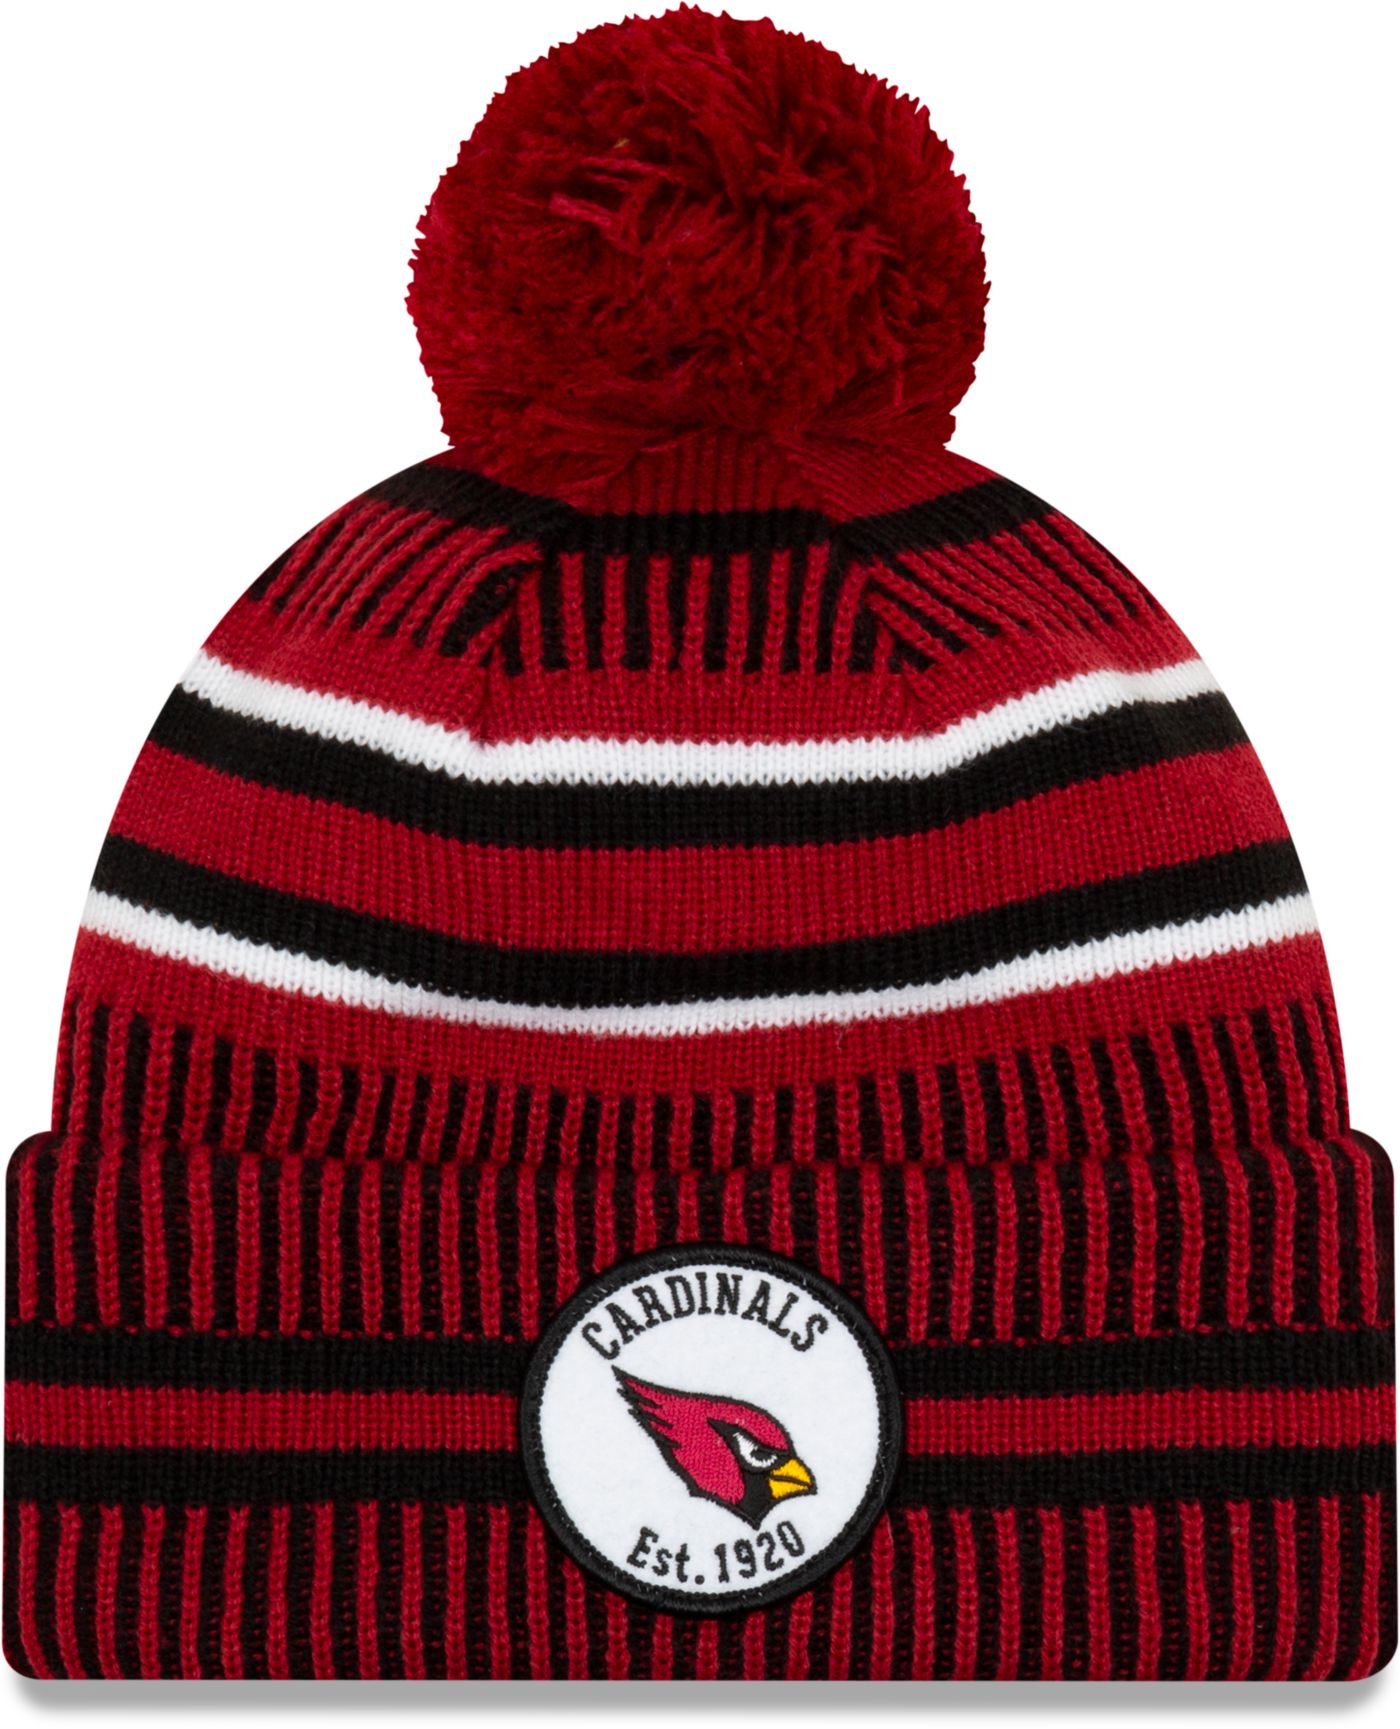 New Era Men's Arizona Cardinals Sideline Home Sport Pom Knit